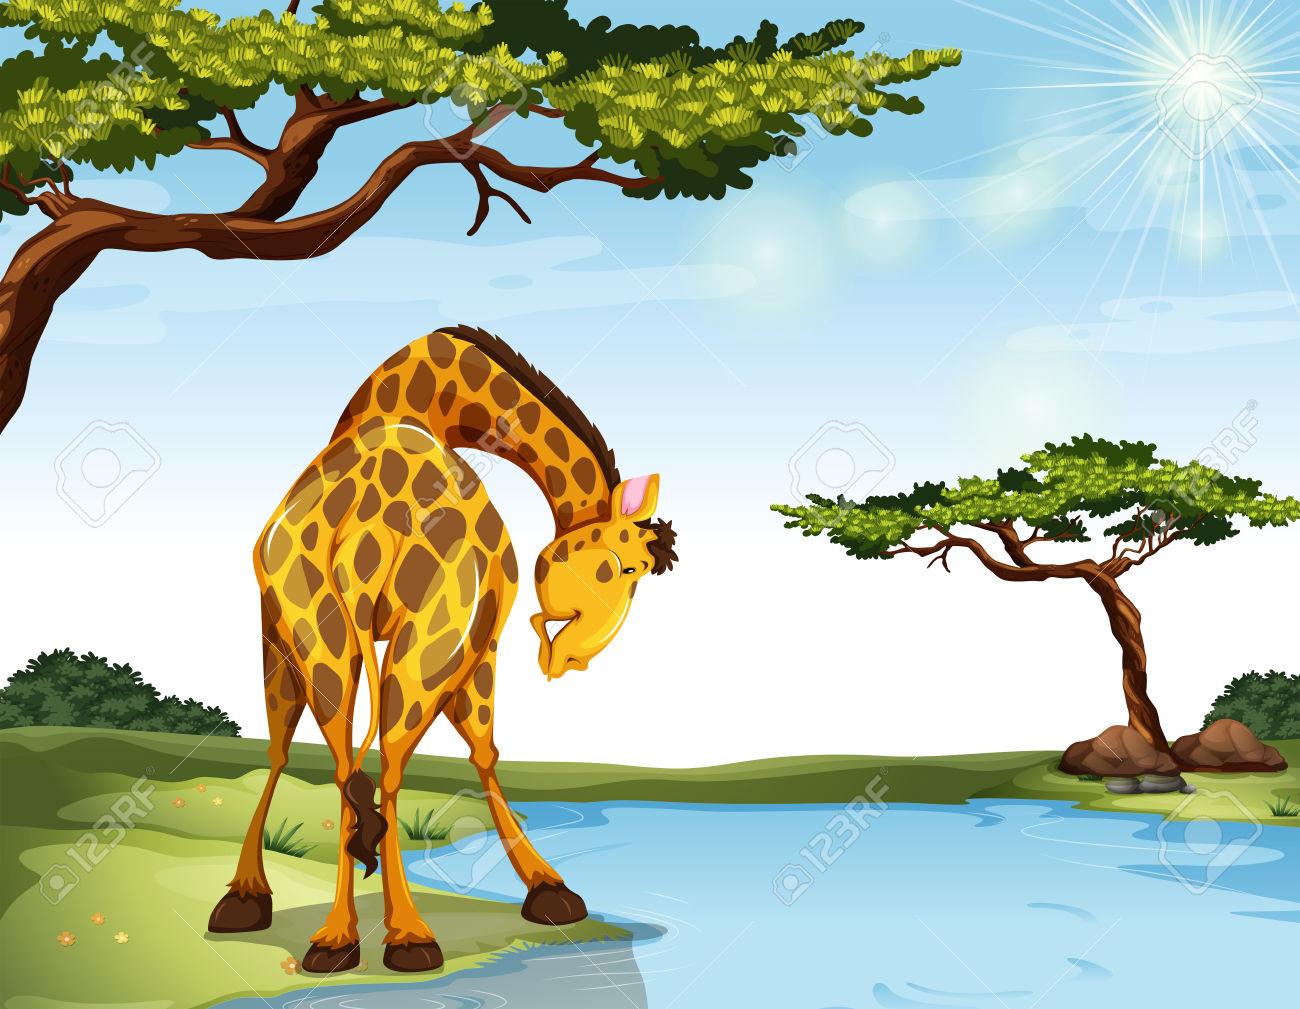 Giraffe Standing At The River Bank Royalty Free Cliparts, Vectors.